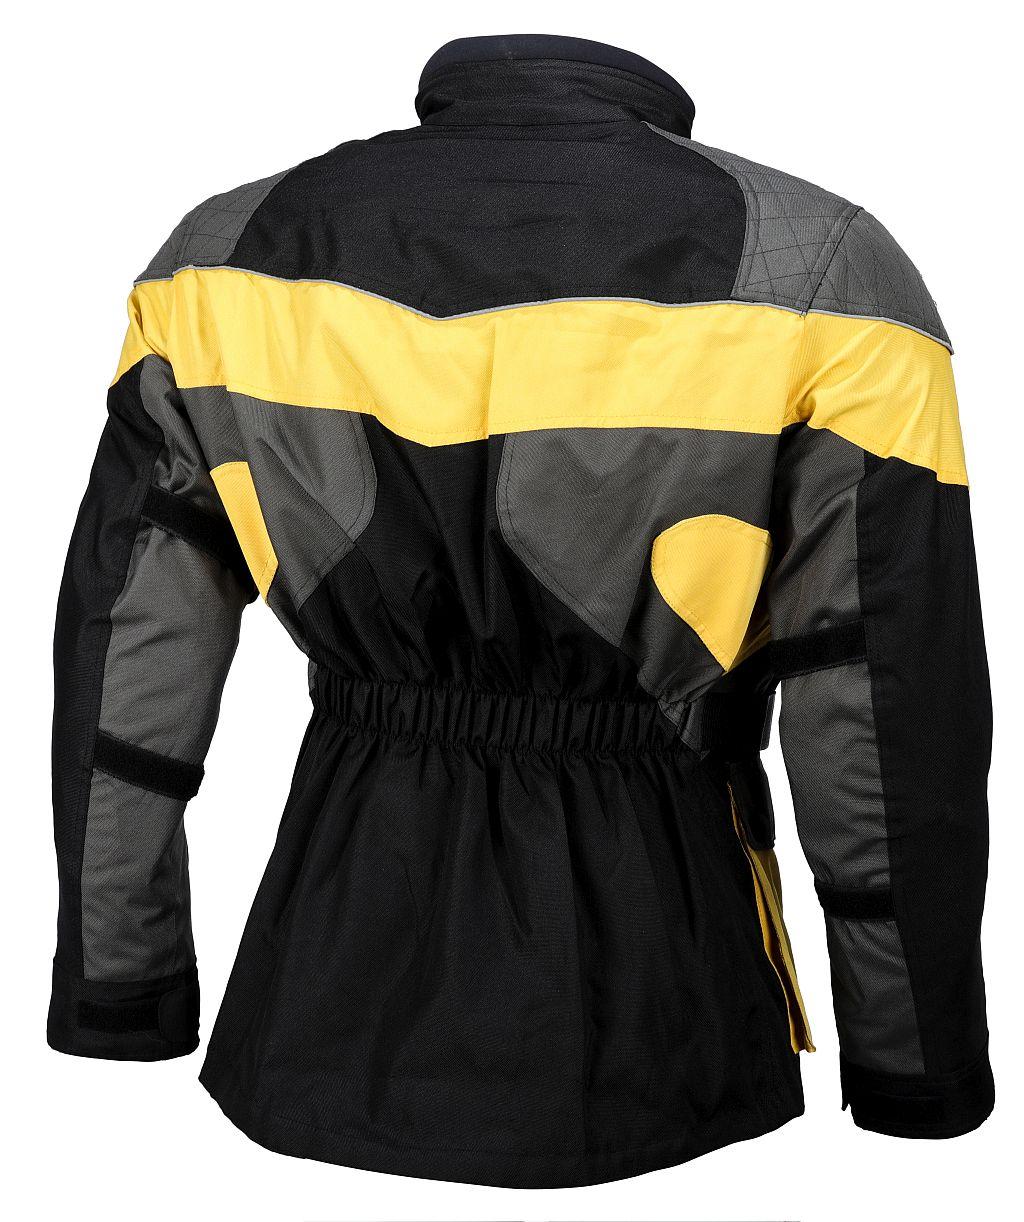 Kinder Motorrad Jacke Motorradjacke Cordura MX Gelb schwarz Neu 128 - 164